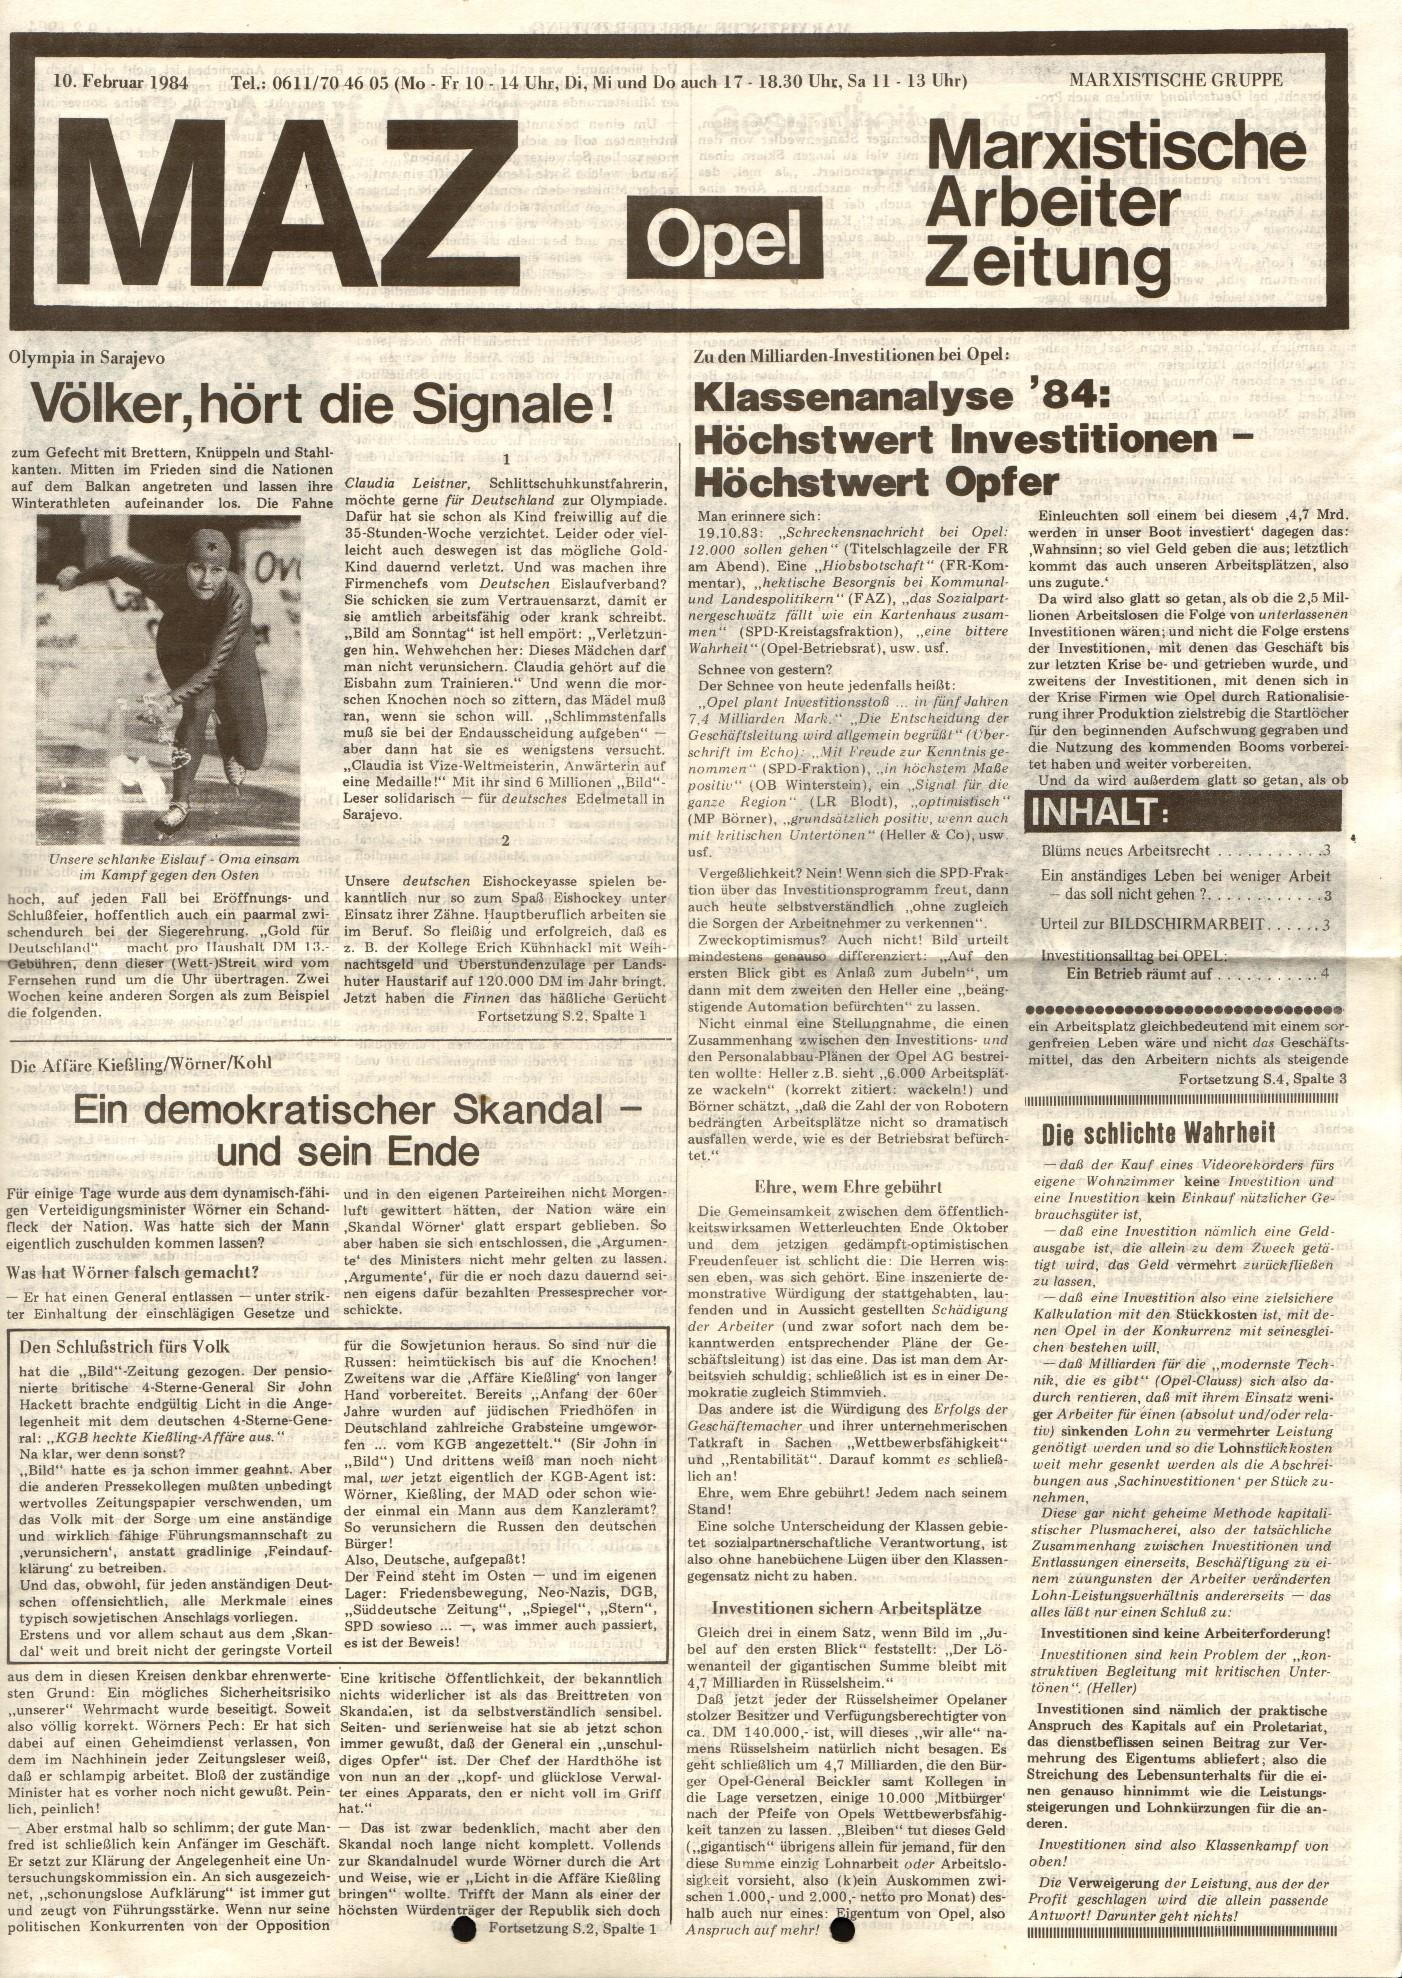 Ruesselsheim_MG_Marxistische_Arbeiterzeitung_Opel_19840210_01